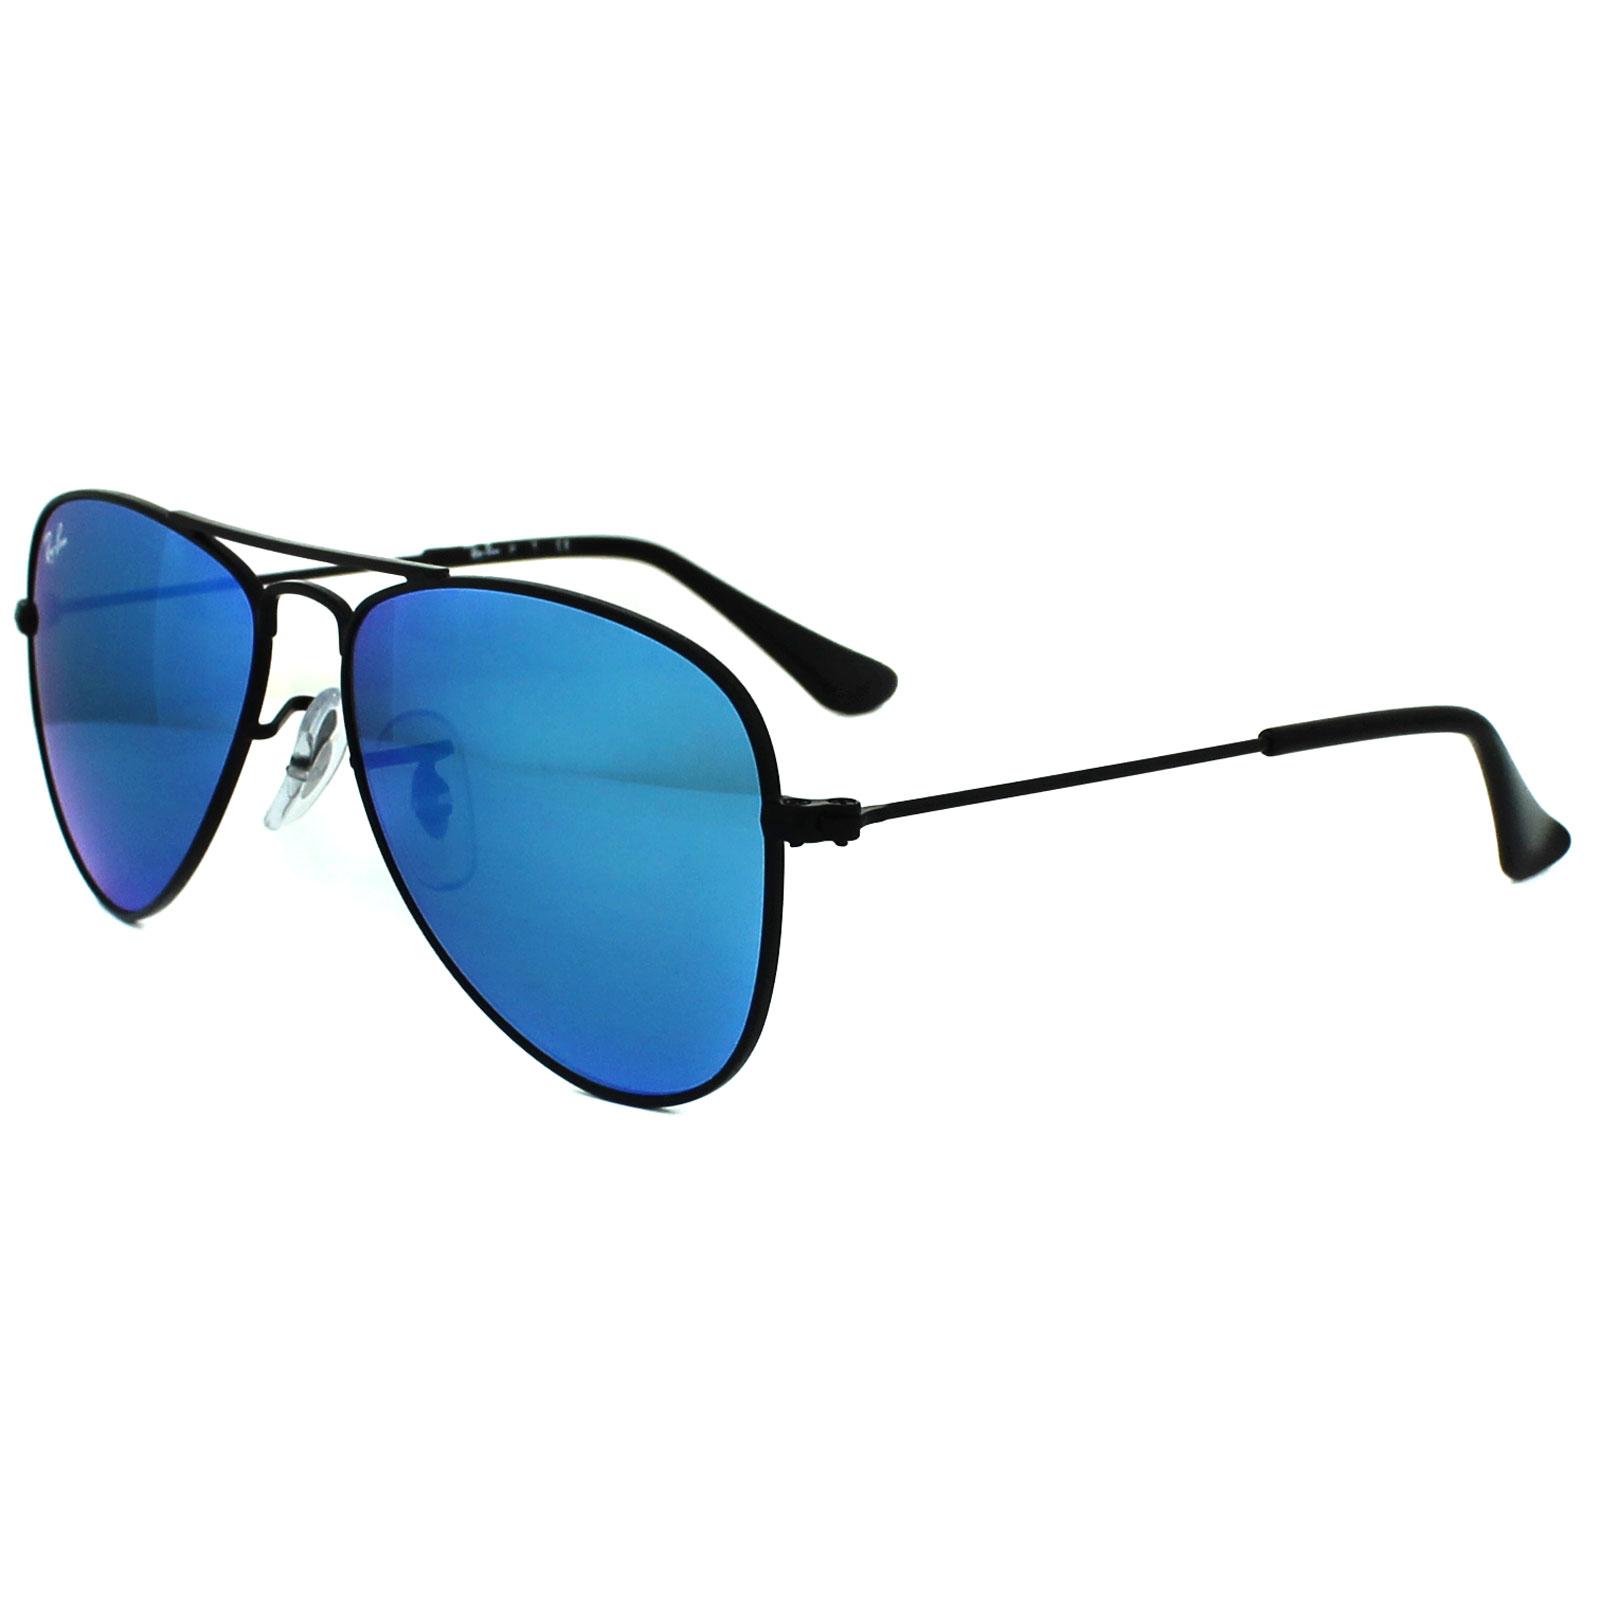 ray ban junior sonnenbrille 9506 201 55 schwarz blau flash. Black Bedroom Furniture Sets. Home Design Ideas